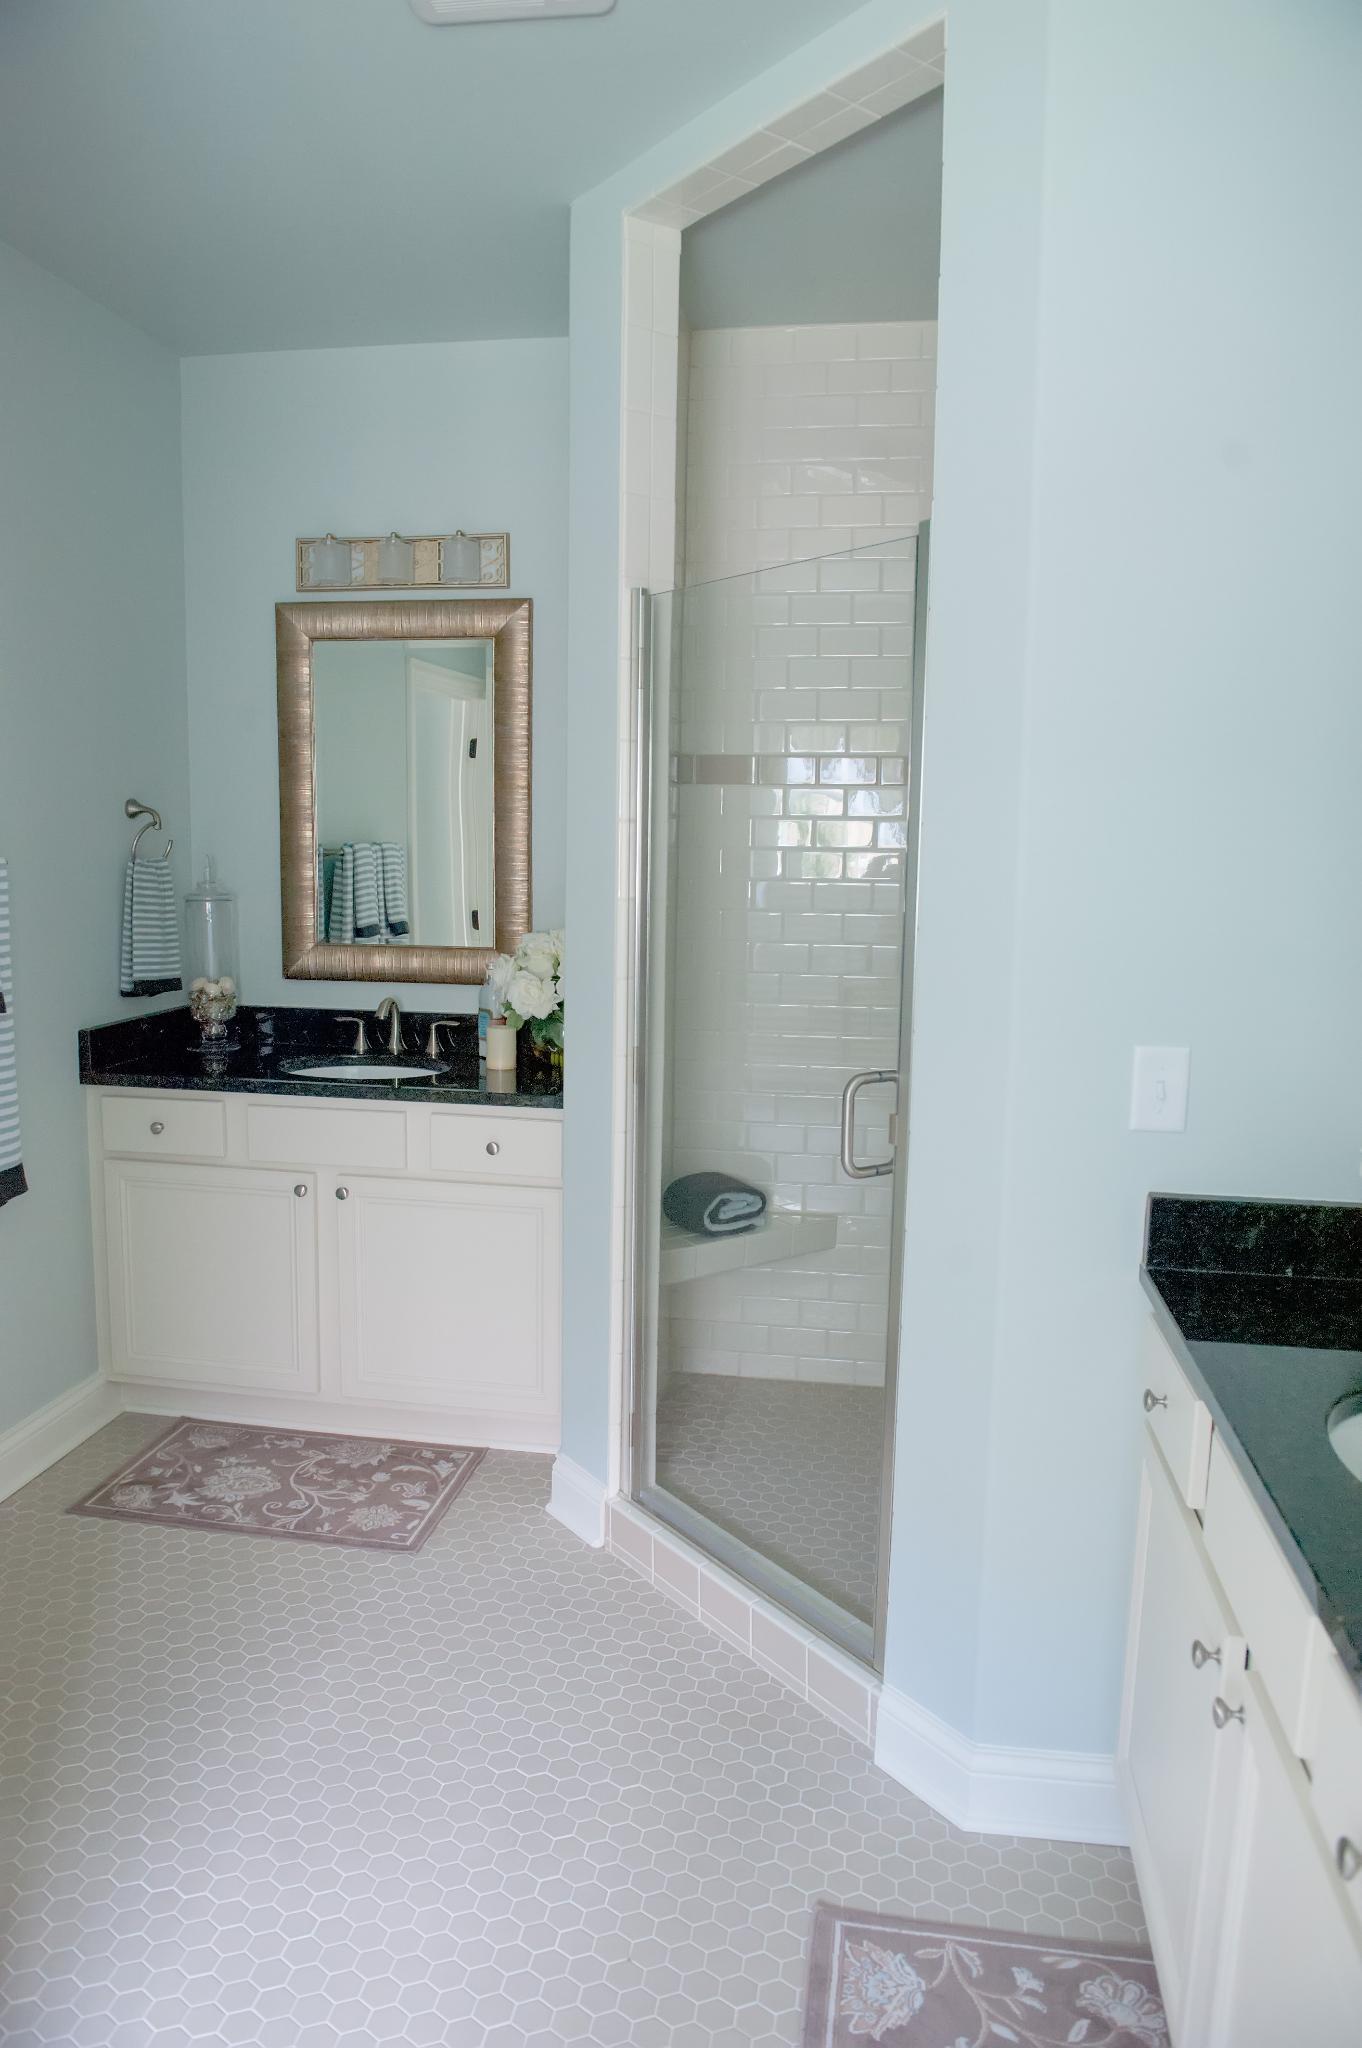 Bathrooms Photos | Korndoerfer Homes